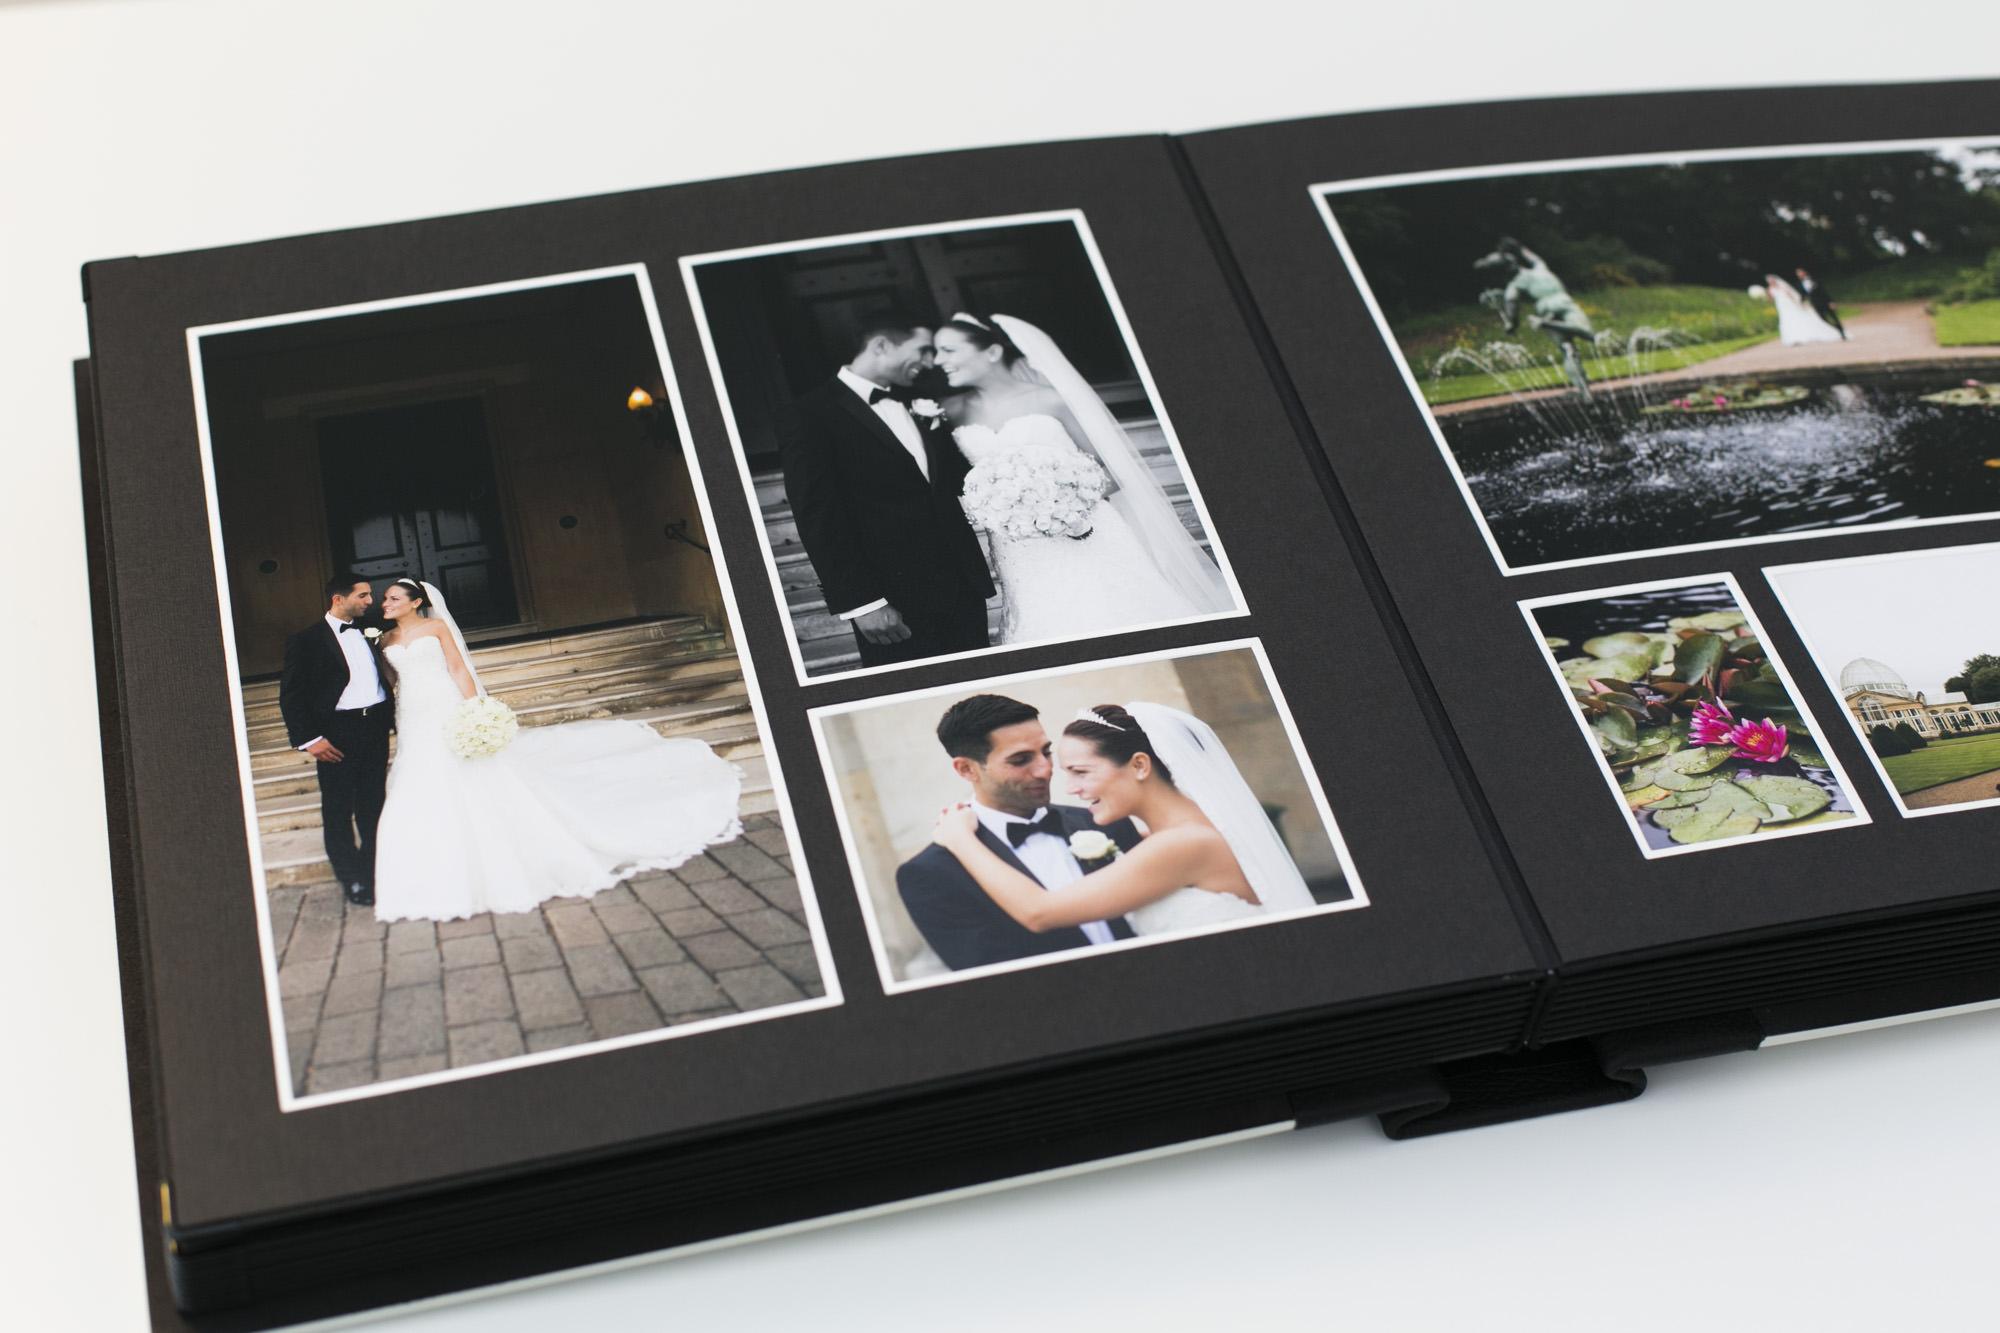 Wedding Photo Albums Cambridge, Cambridgeshire 10